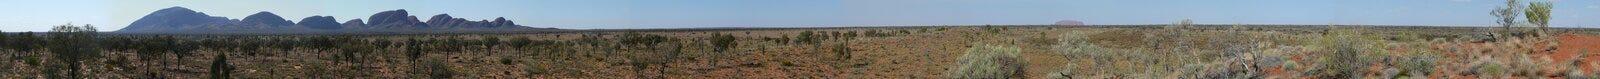 Kata Tjuta (Olgas) et panorama d'Uluru (roche d'Ayers) Photo stock